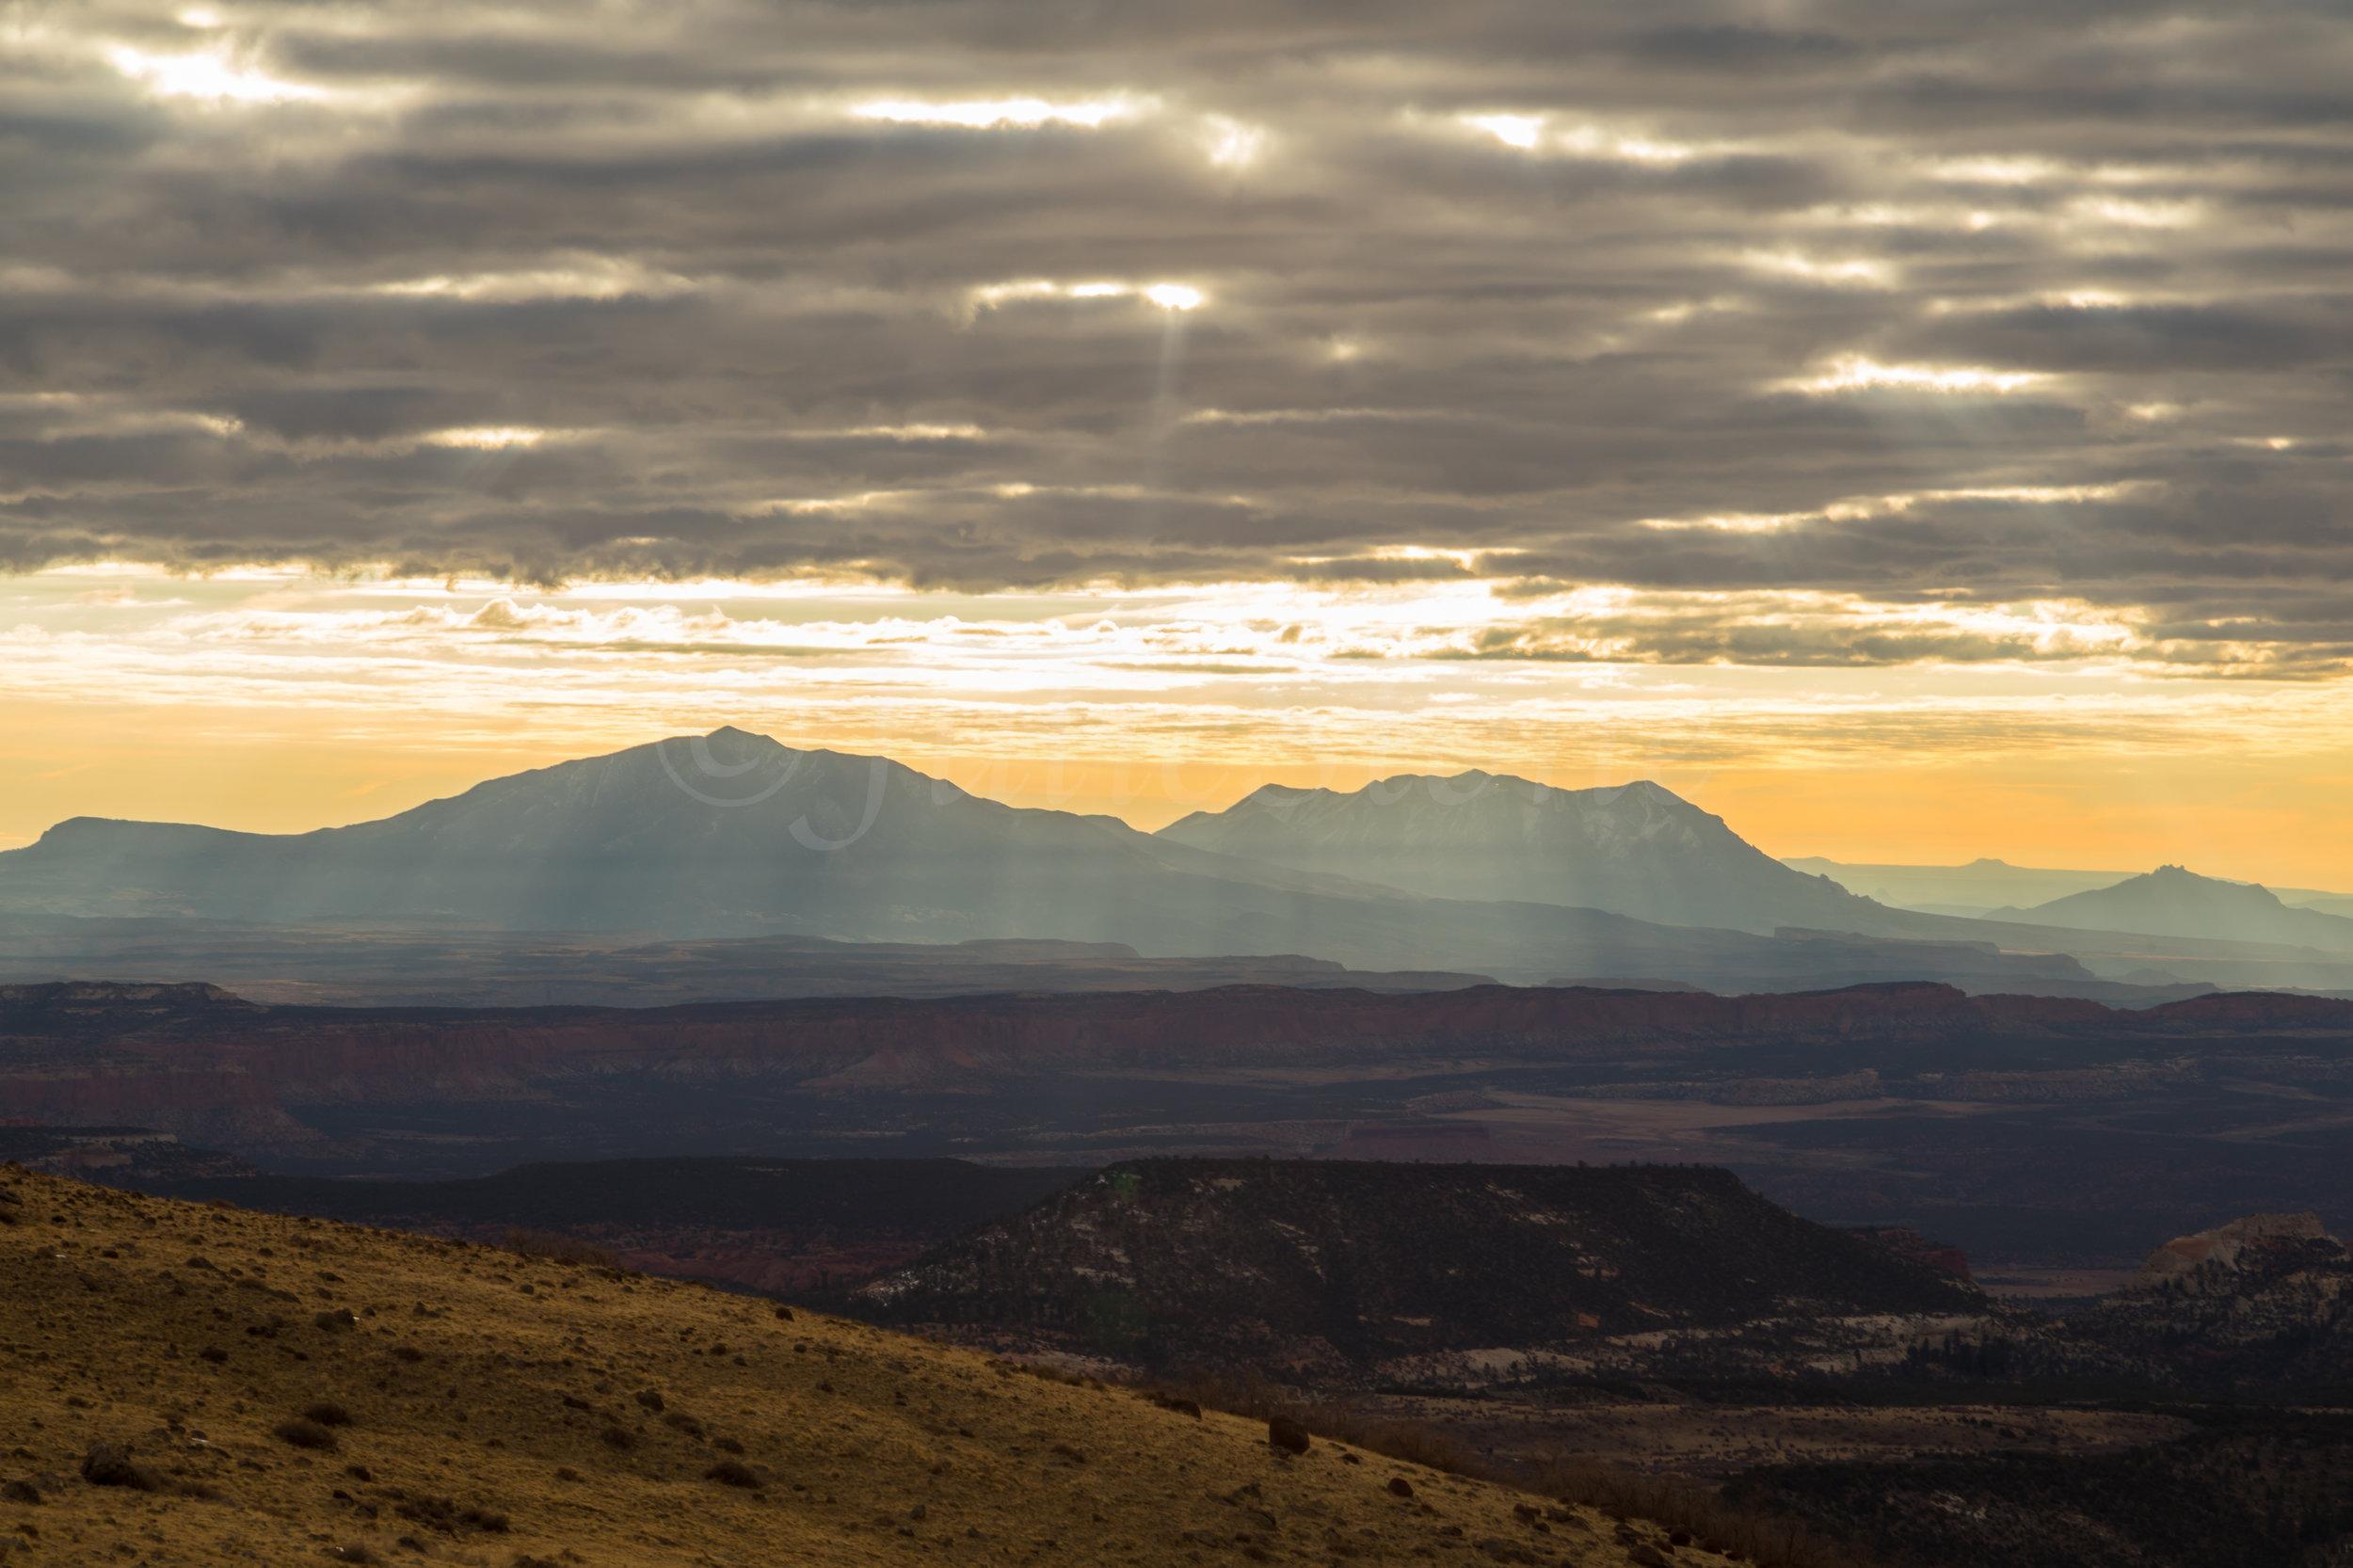 Boulder Mountain Pass, Image # 6692